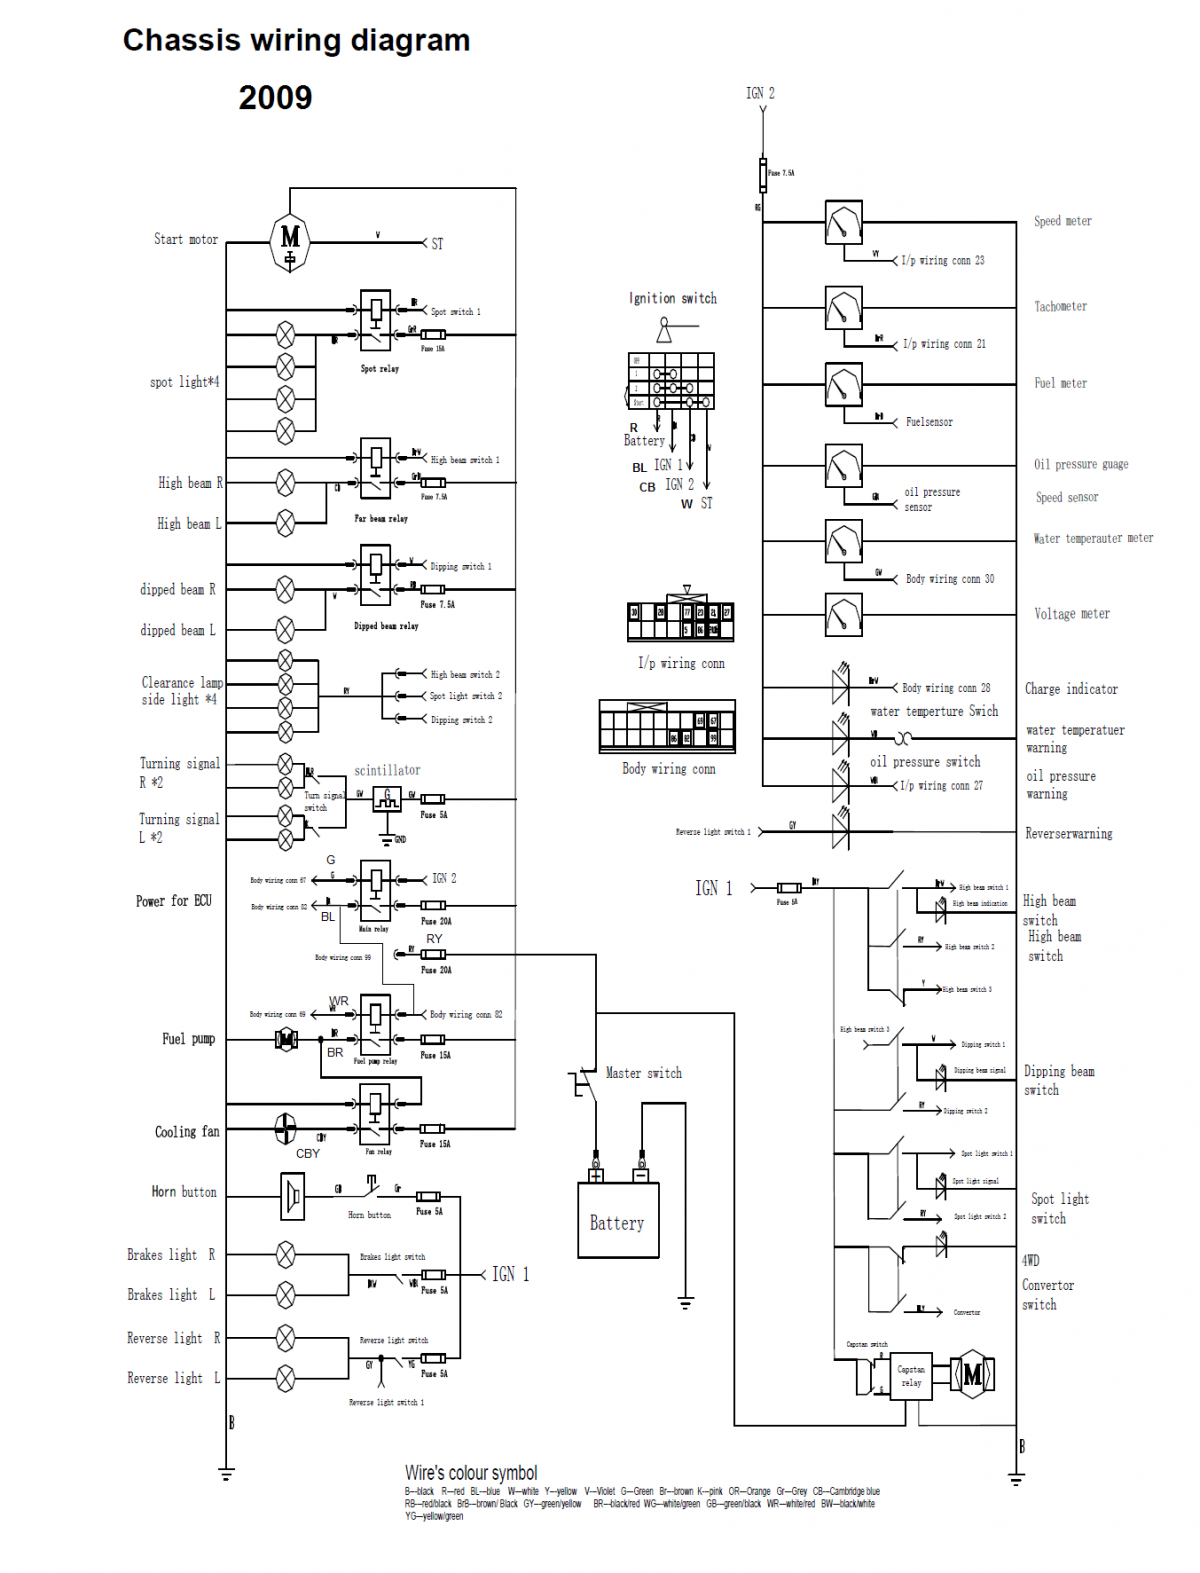 Joyner Starter Switch Wire Diagram Books Of Wiring Lighting Trooper 1100cc Utv Sxs Forum Board Rh Utvboard Com